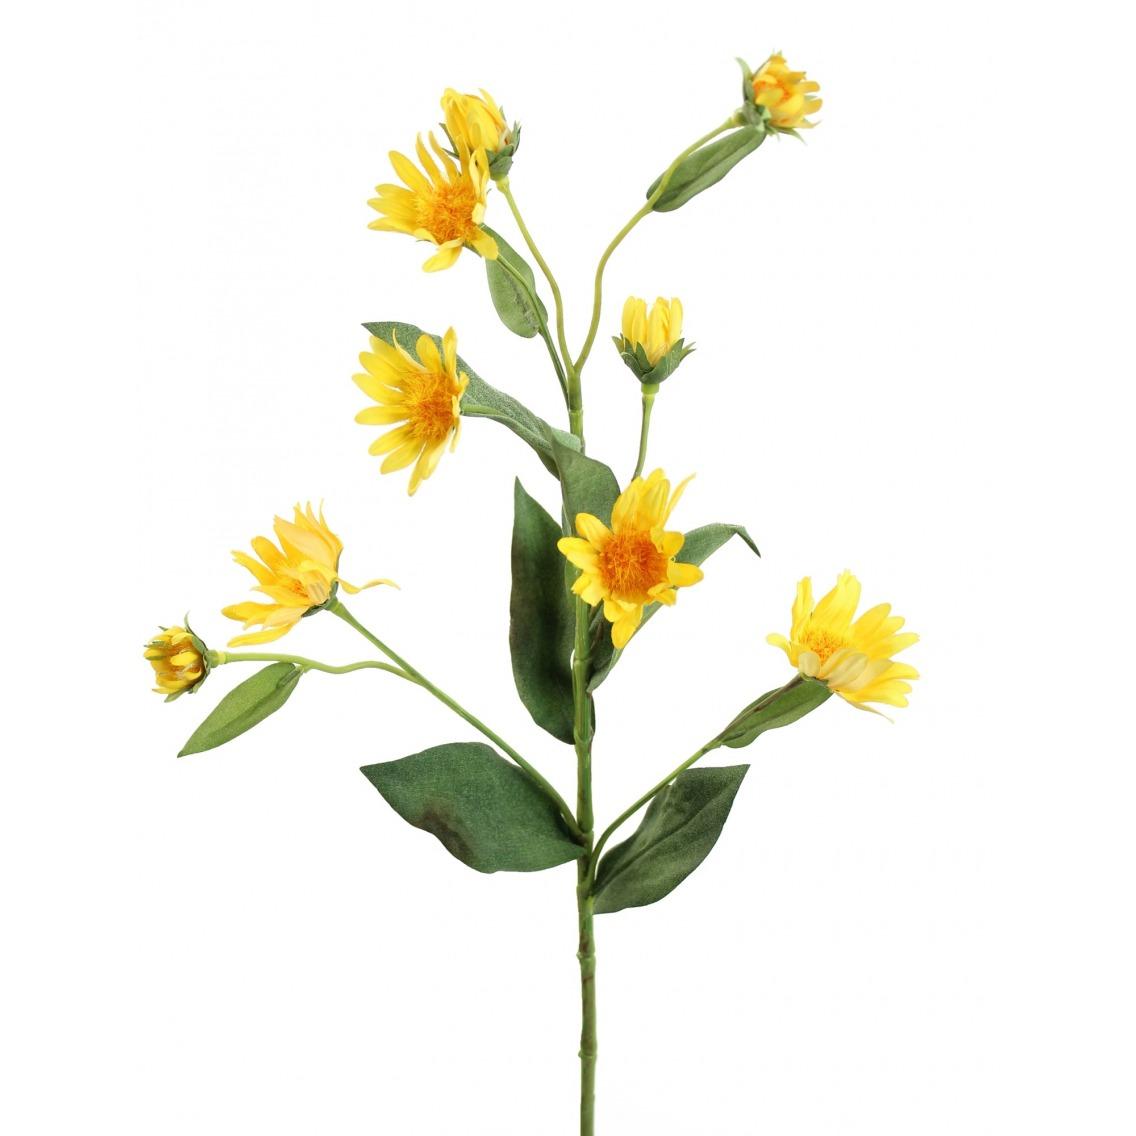 Aster artificiel jaune